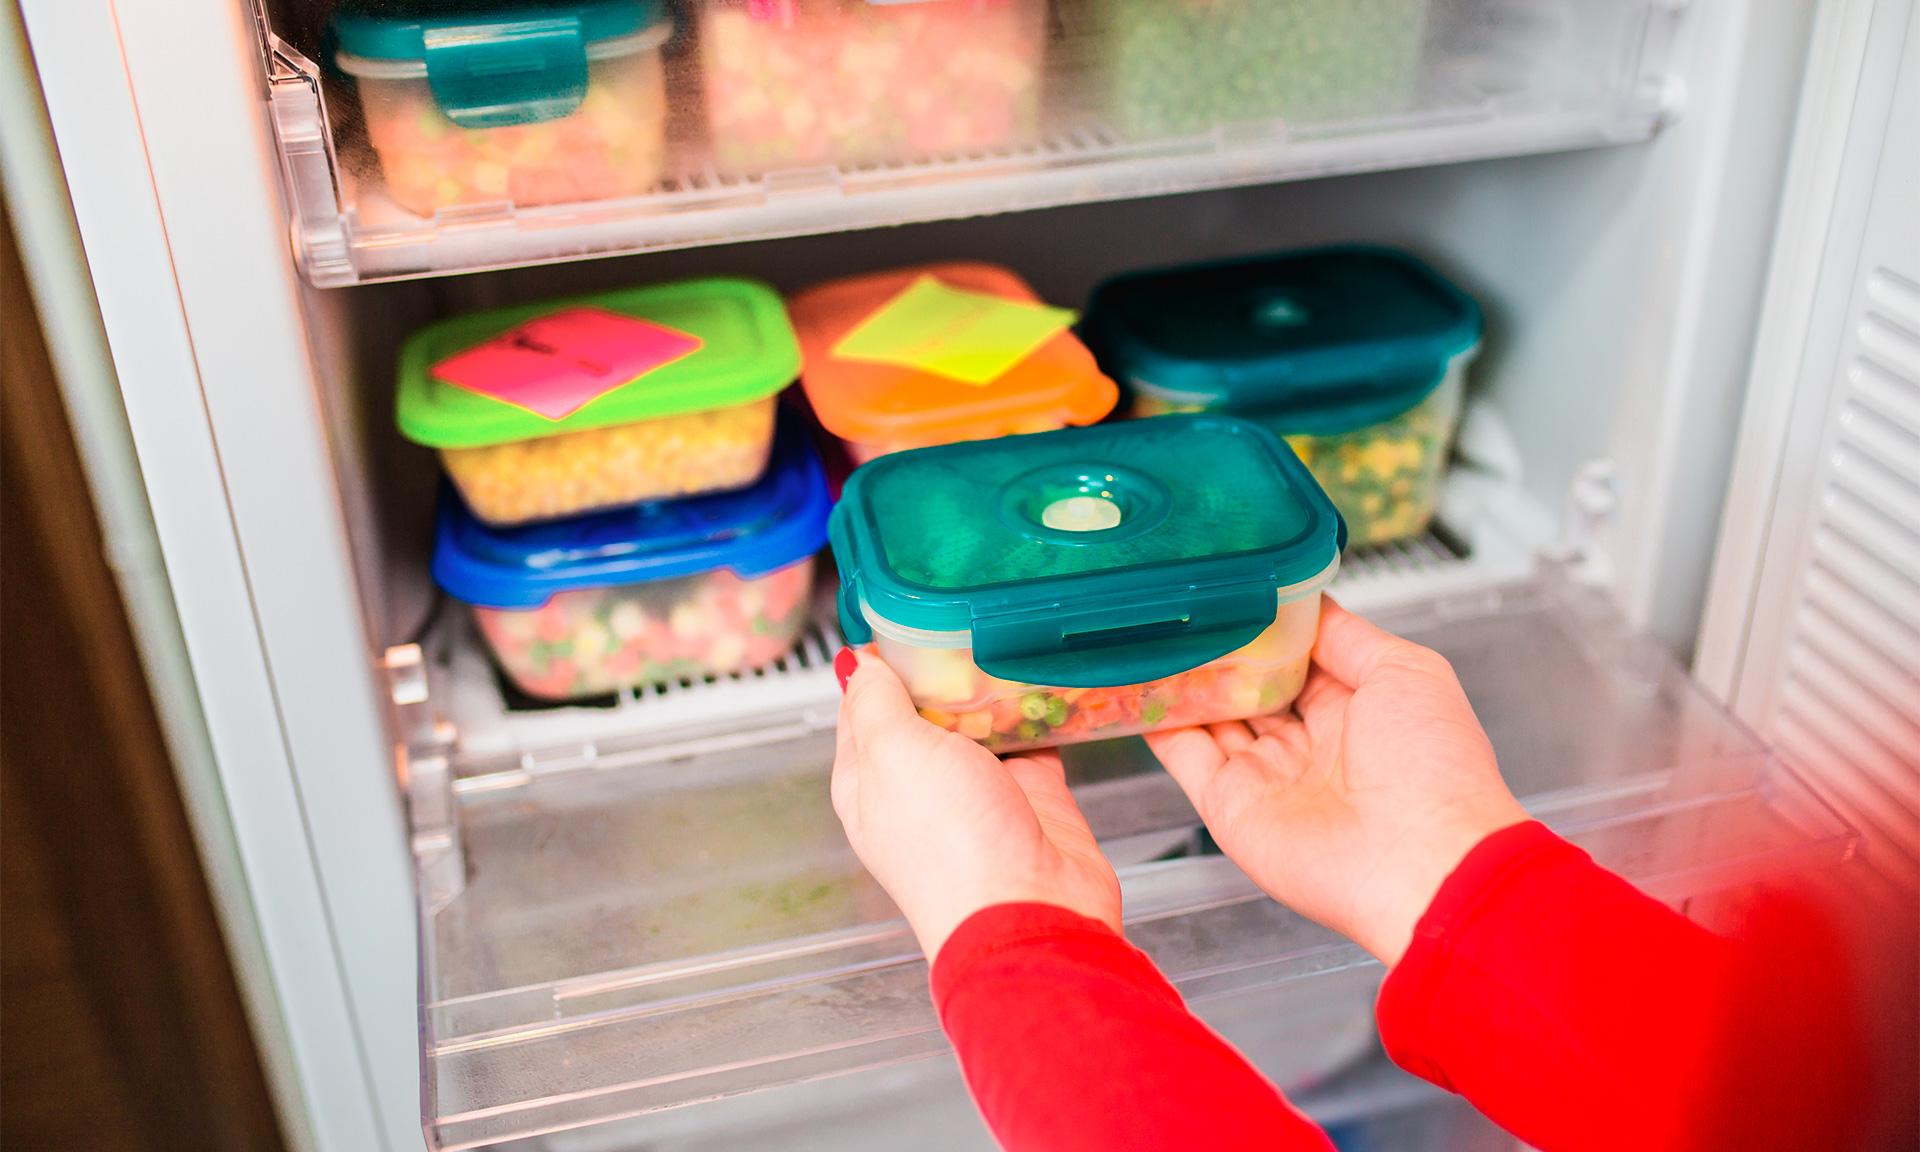 Putting food into freezer